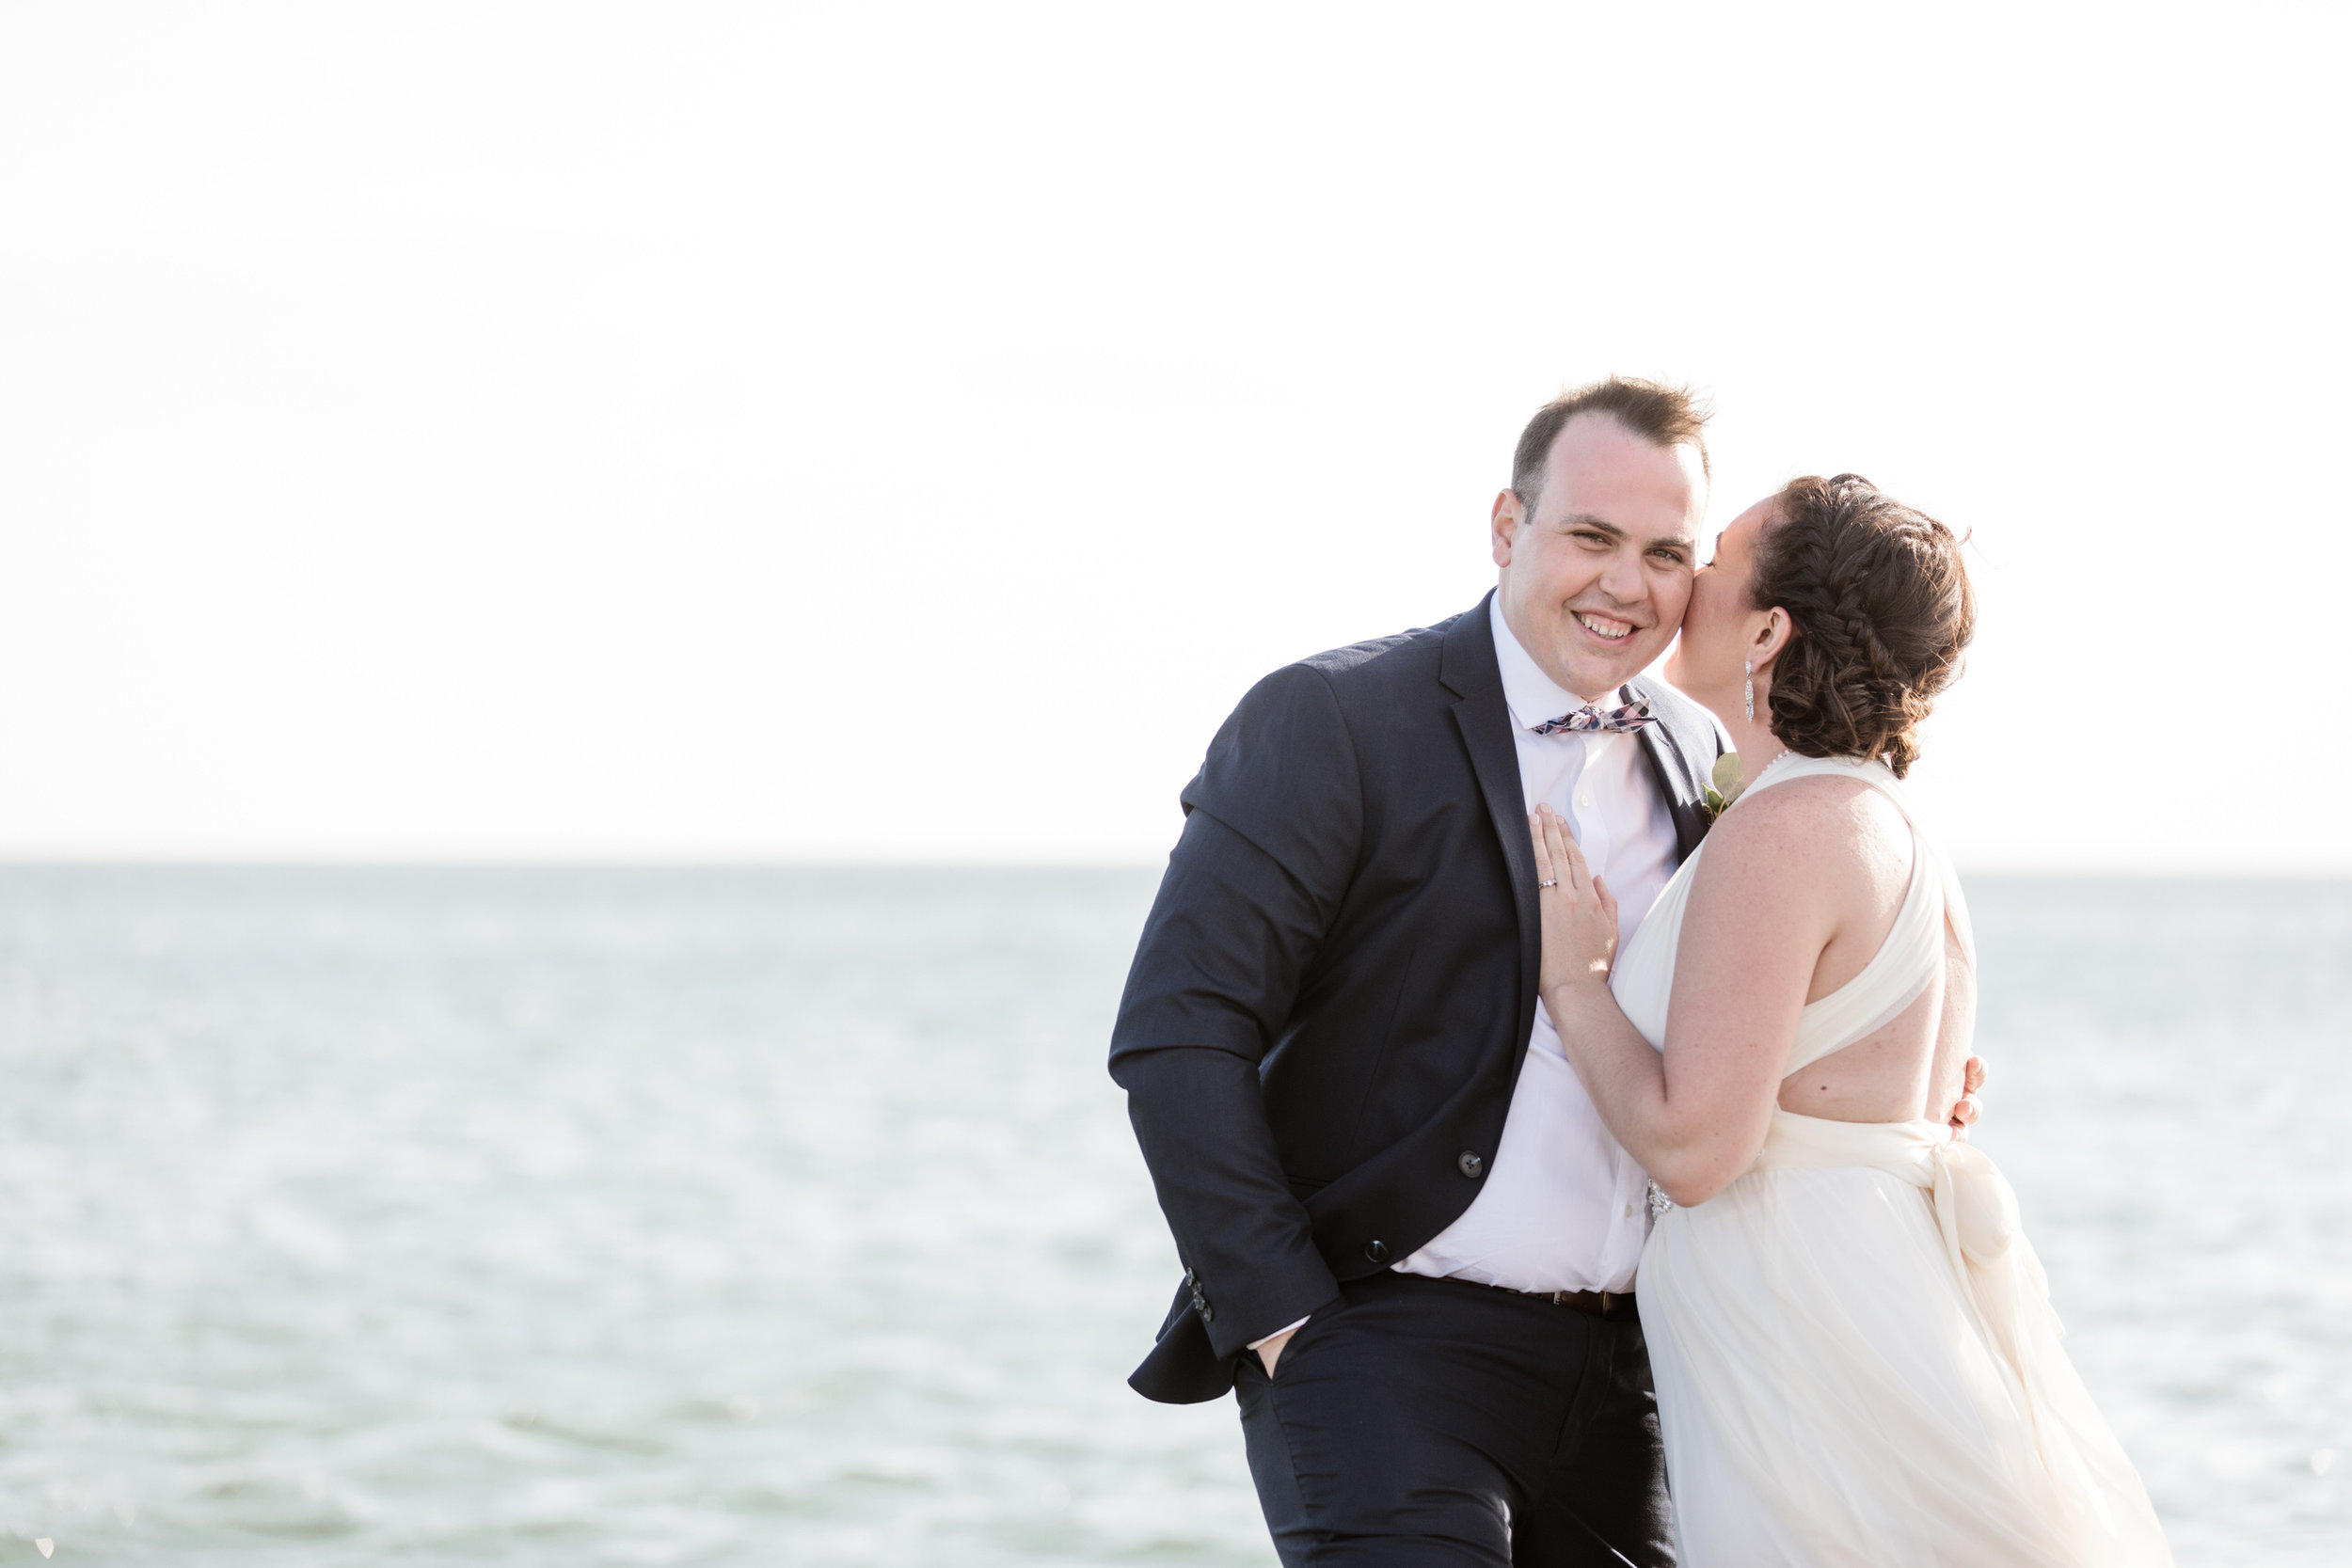 Beltran_Treasure_Island_Elopement_Tampa_Wedding_040-1.jpg